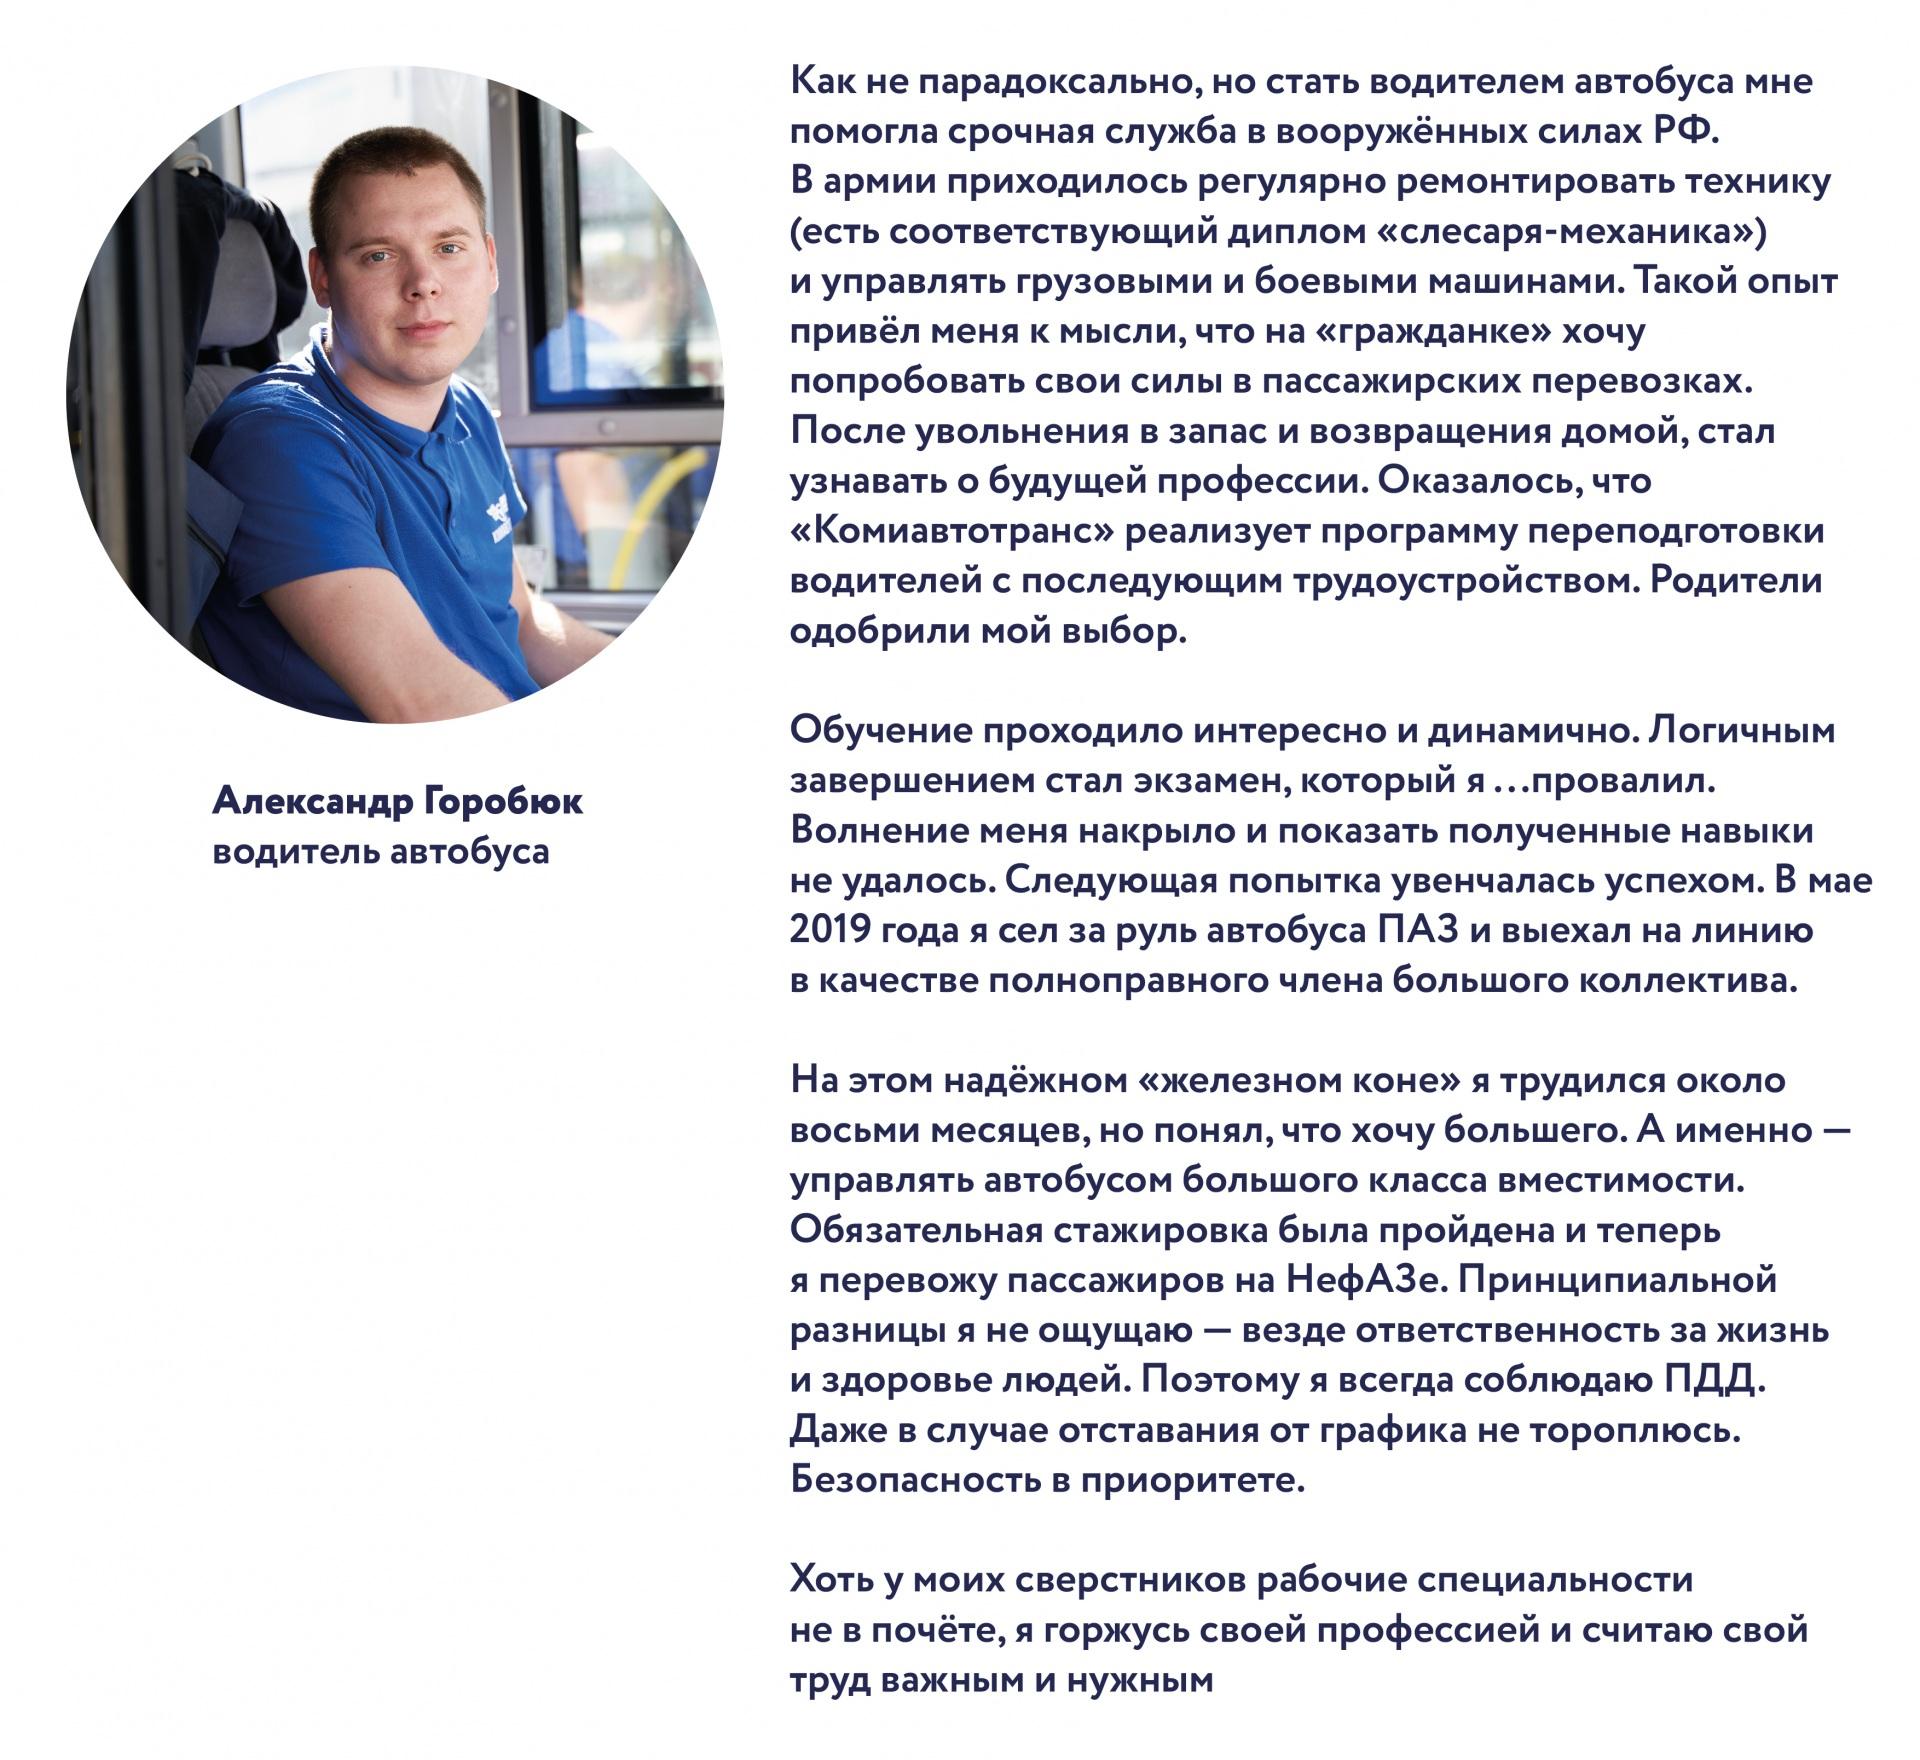 A.-Gorobyuk-01.jpg